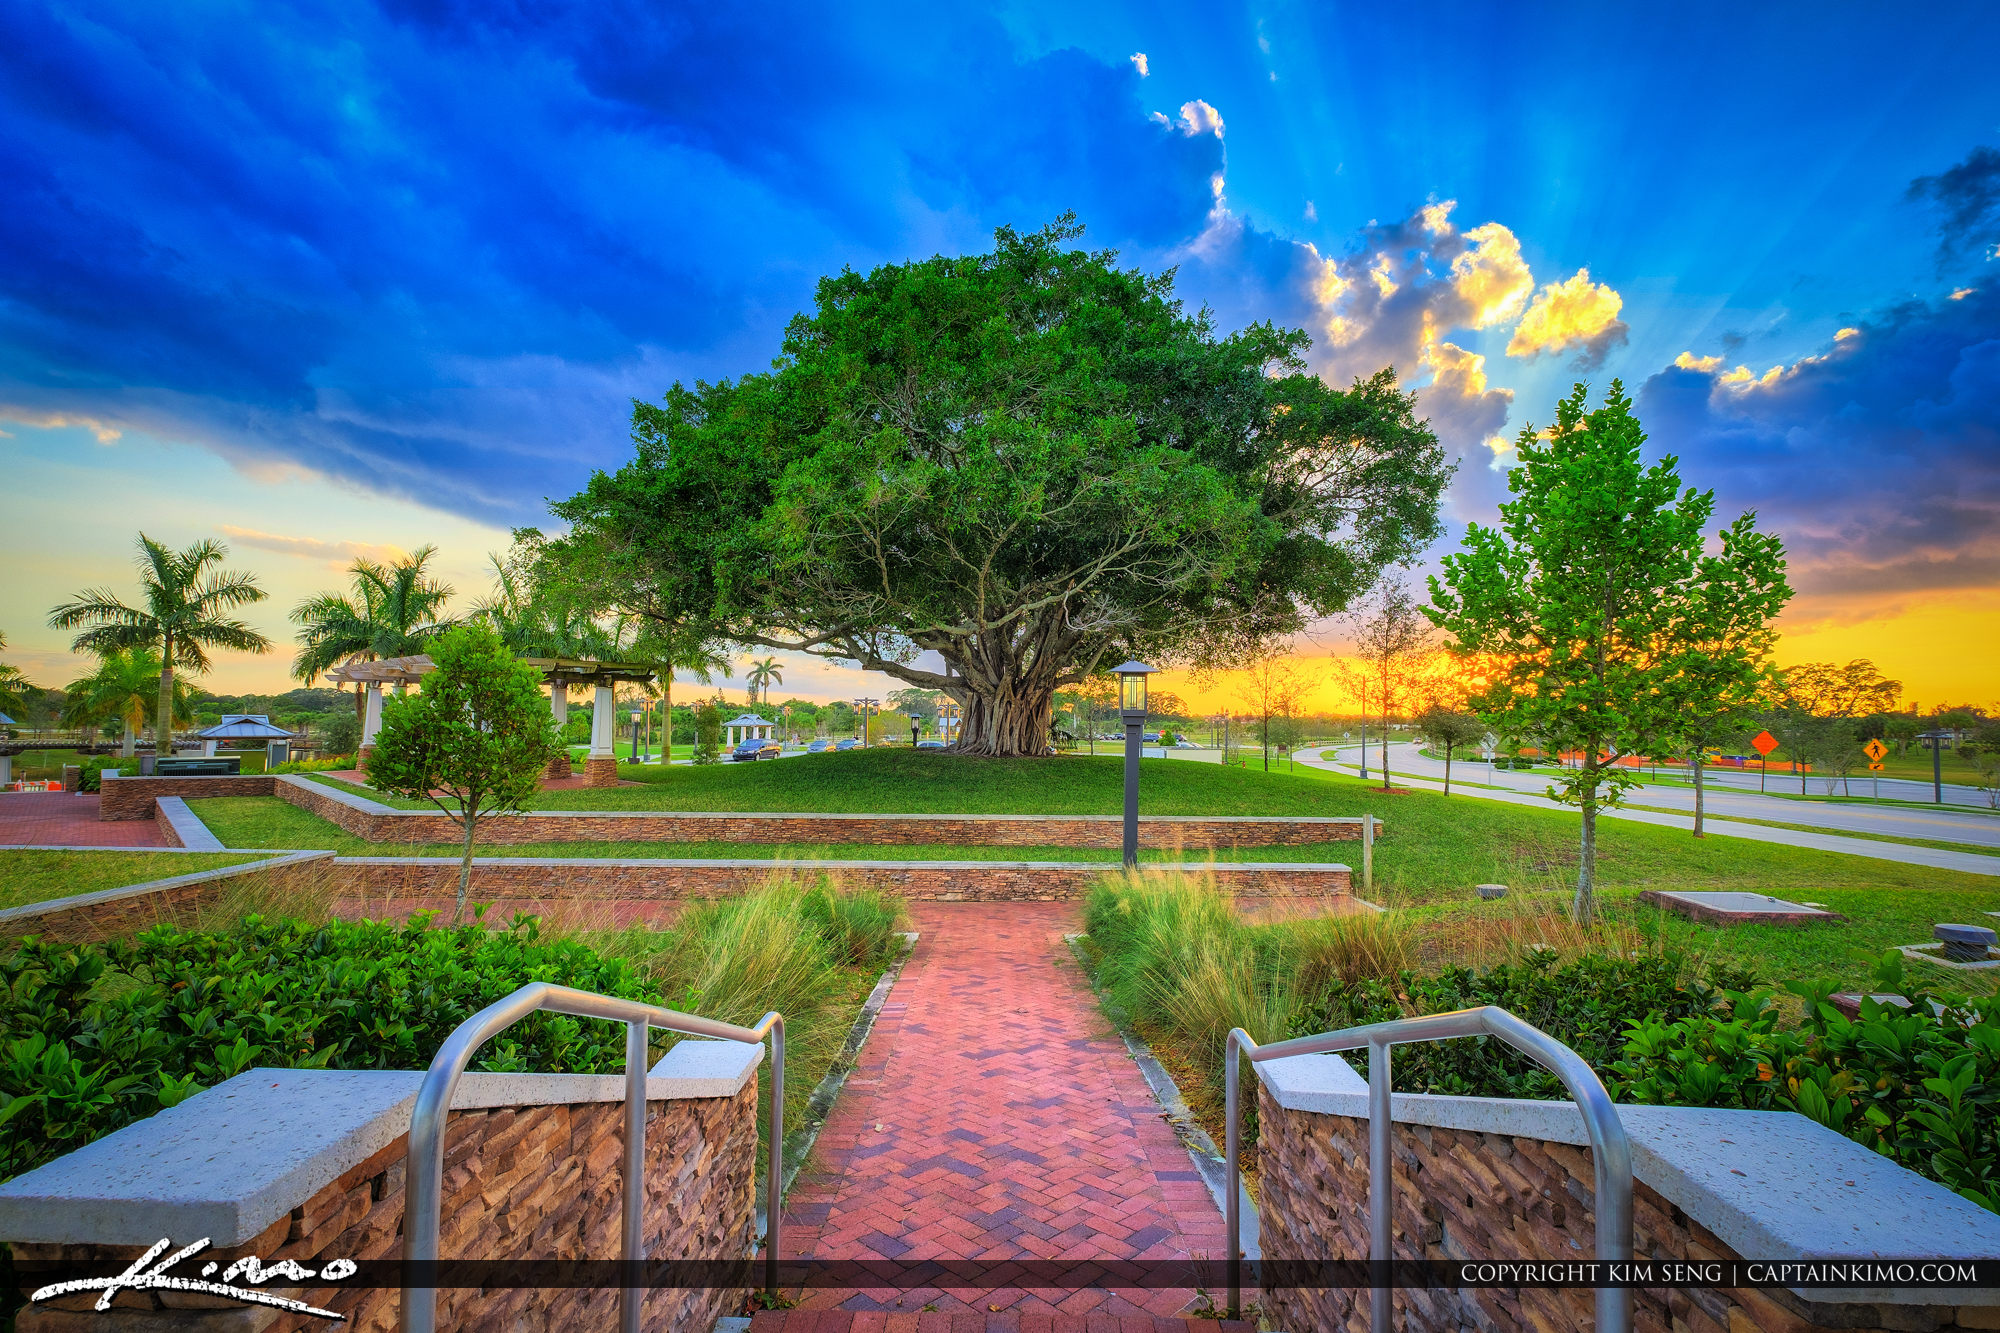 Royal Palm Commons Park in Royal Palm Beach Florida